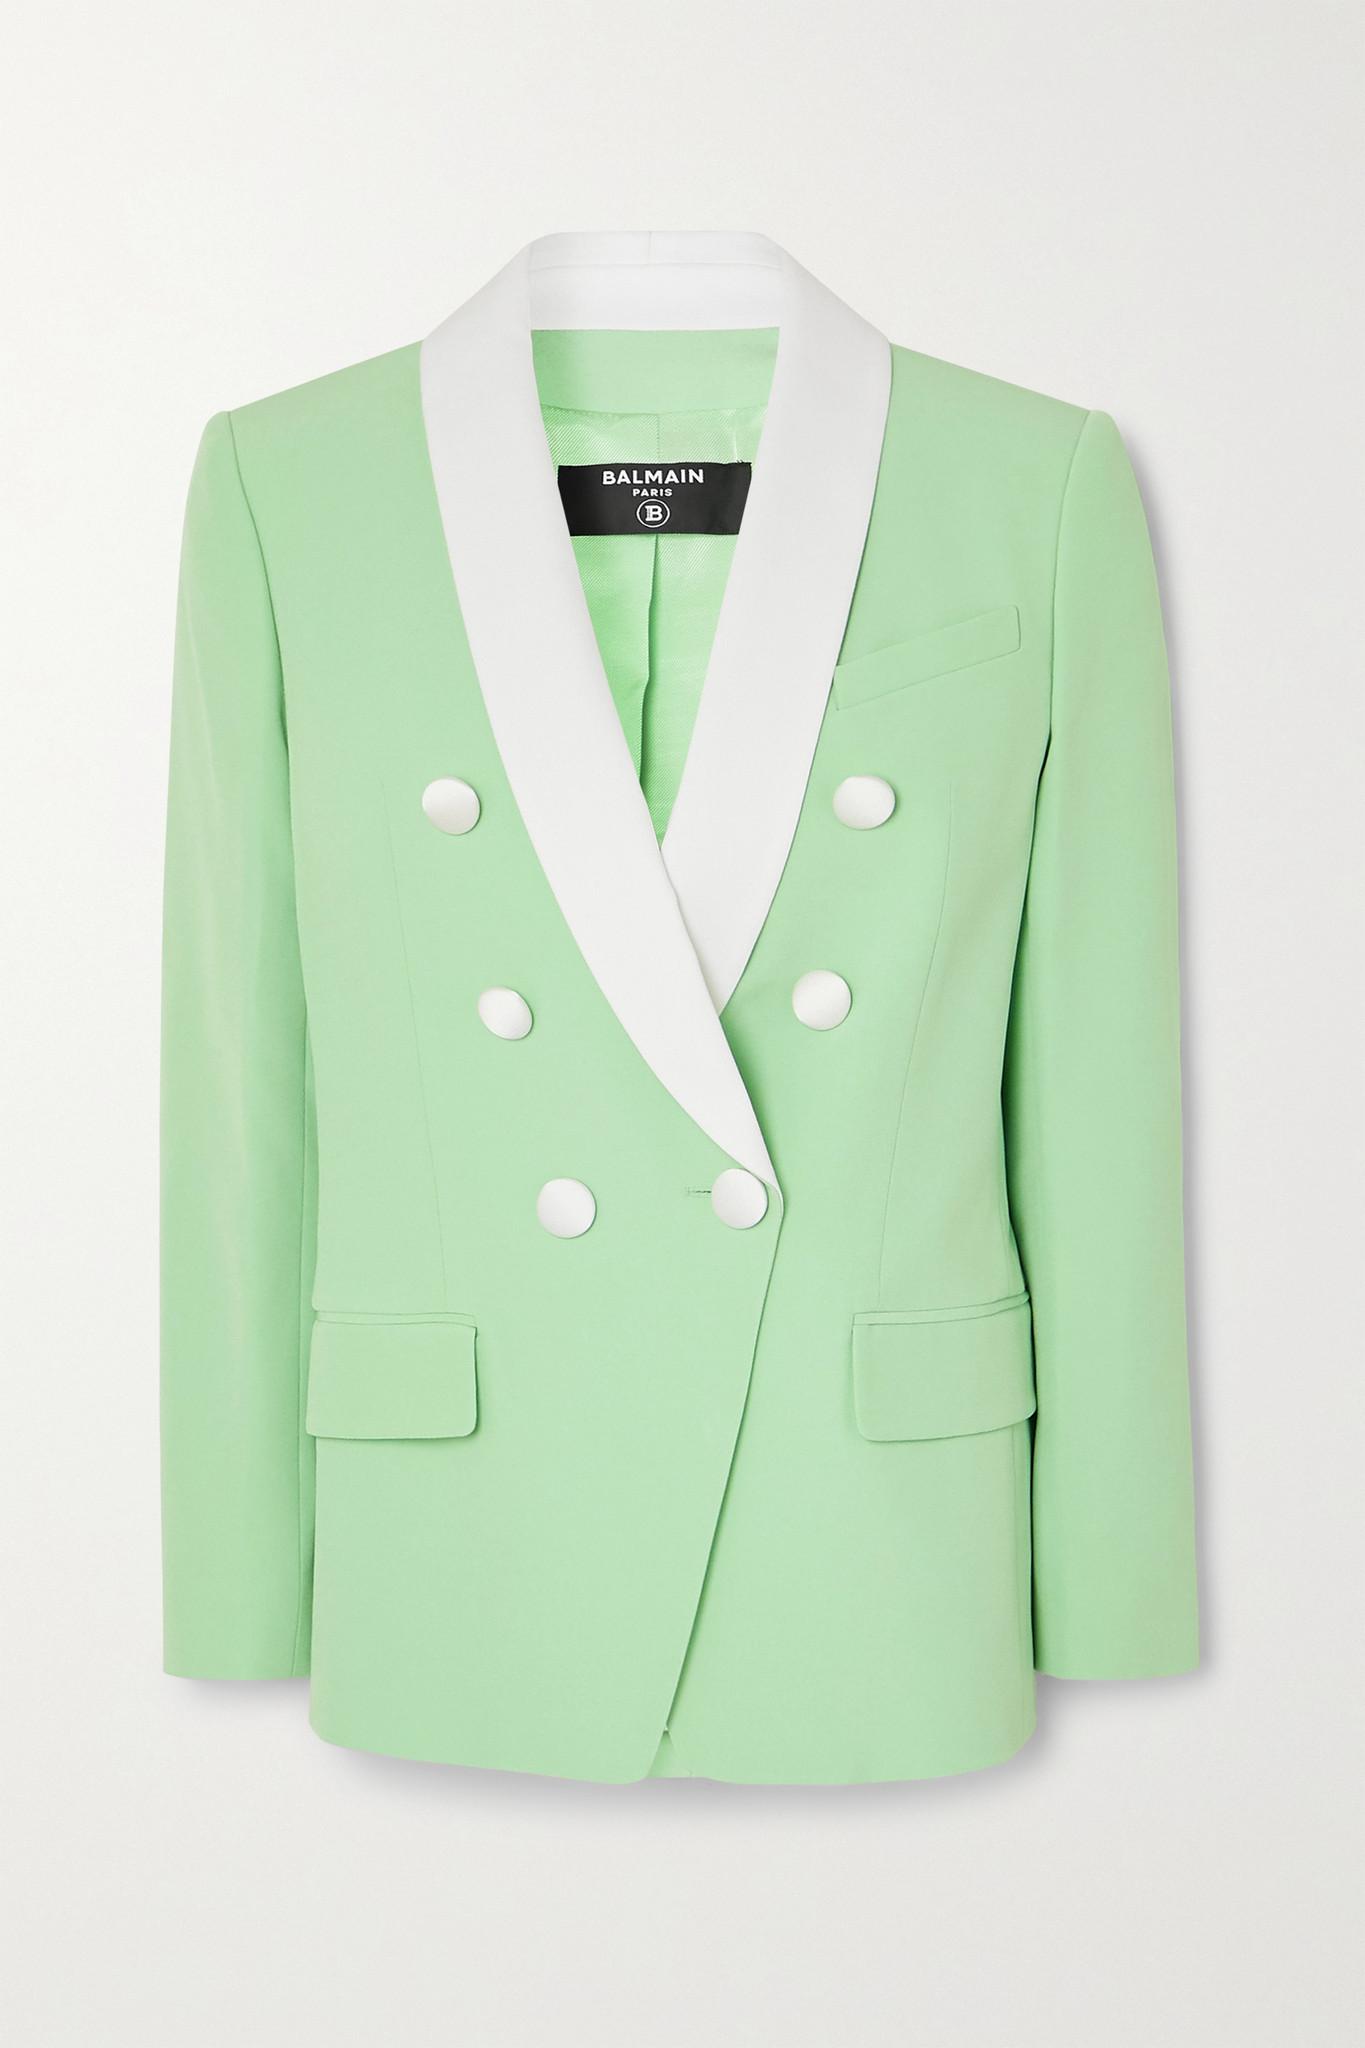 BALMAIN - Double-breasted Two-tone Crepe Blazer - Green - FR38